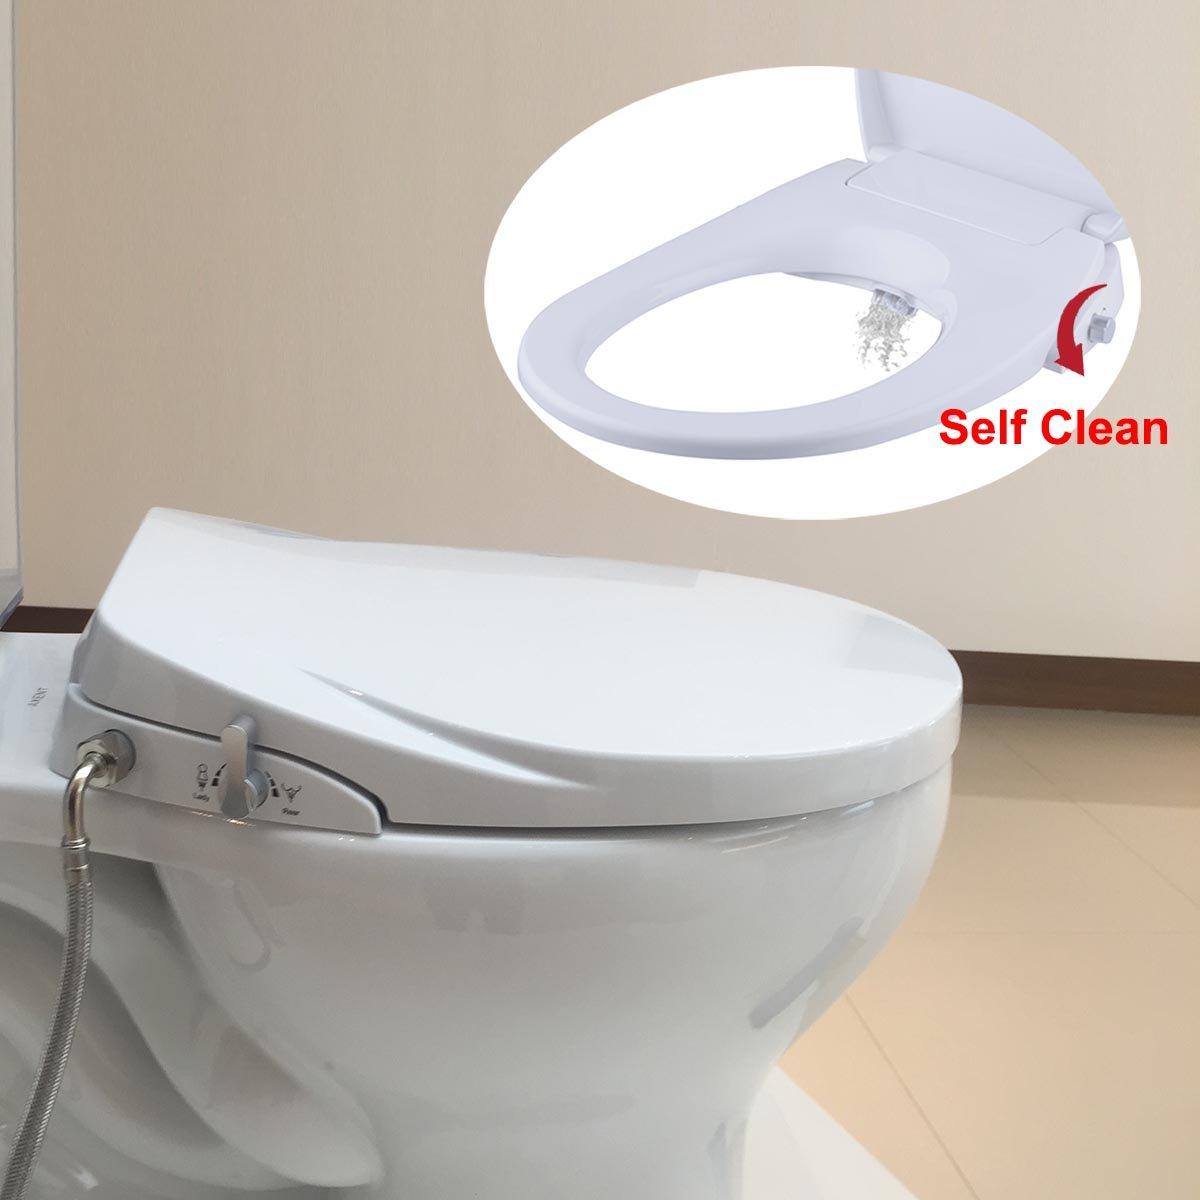 Hibbent Round/Standard Toilet Seat with Bidet - No batteries or ...